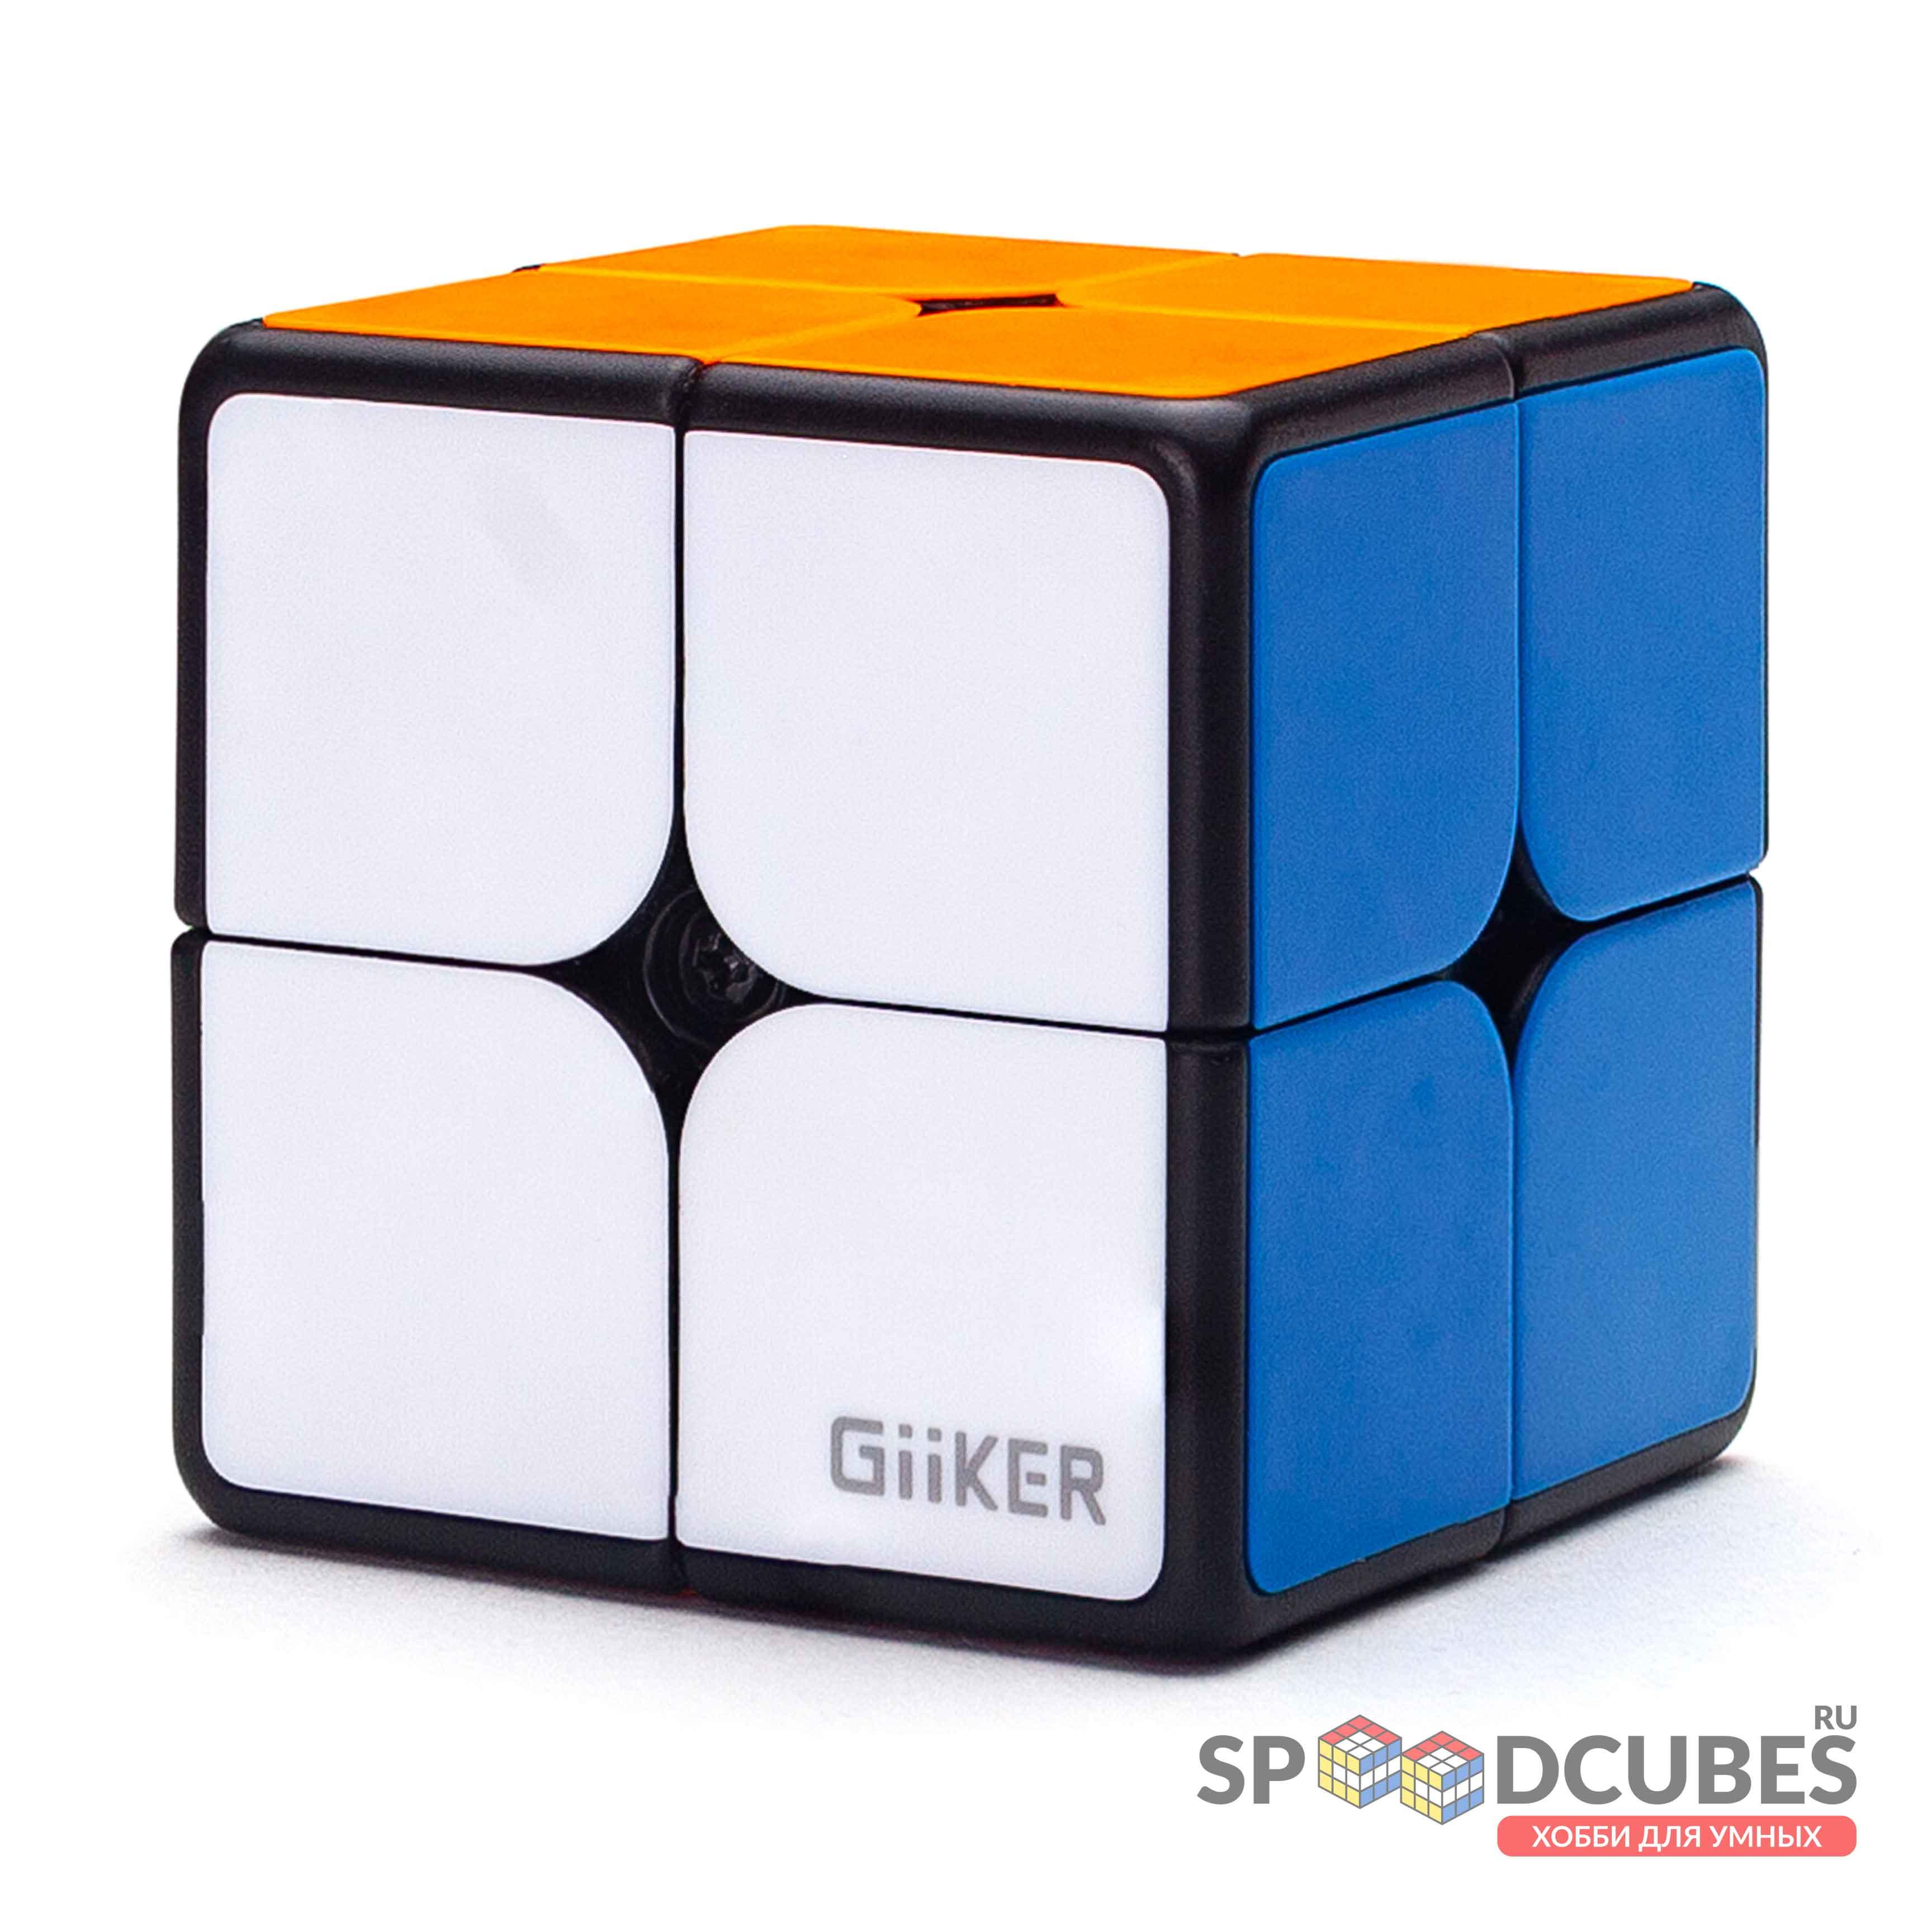 Xiaomi 2x2 Giiker Super Cube I2